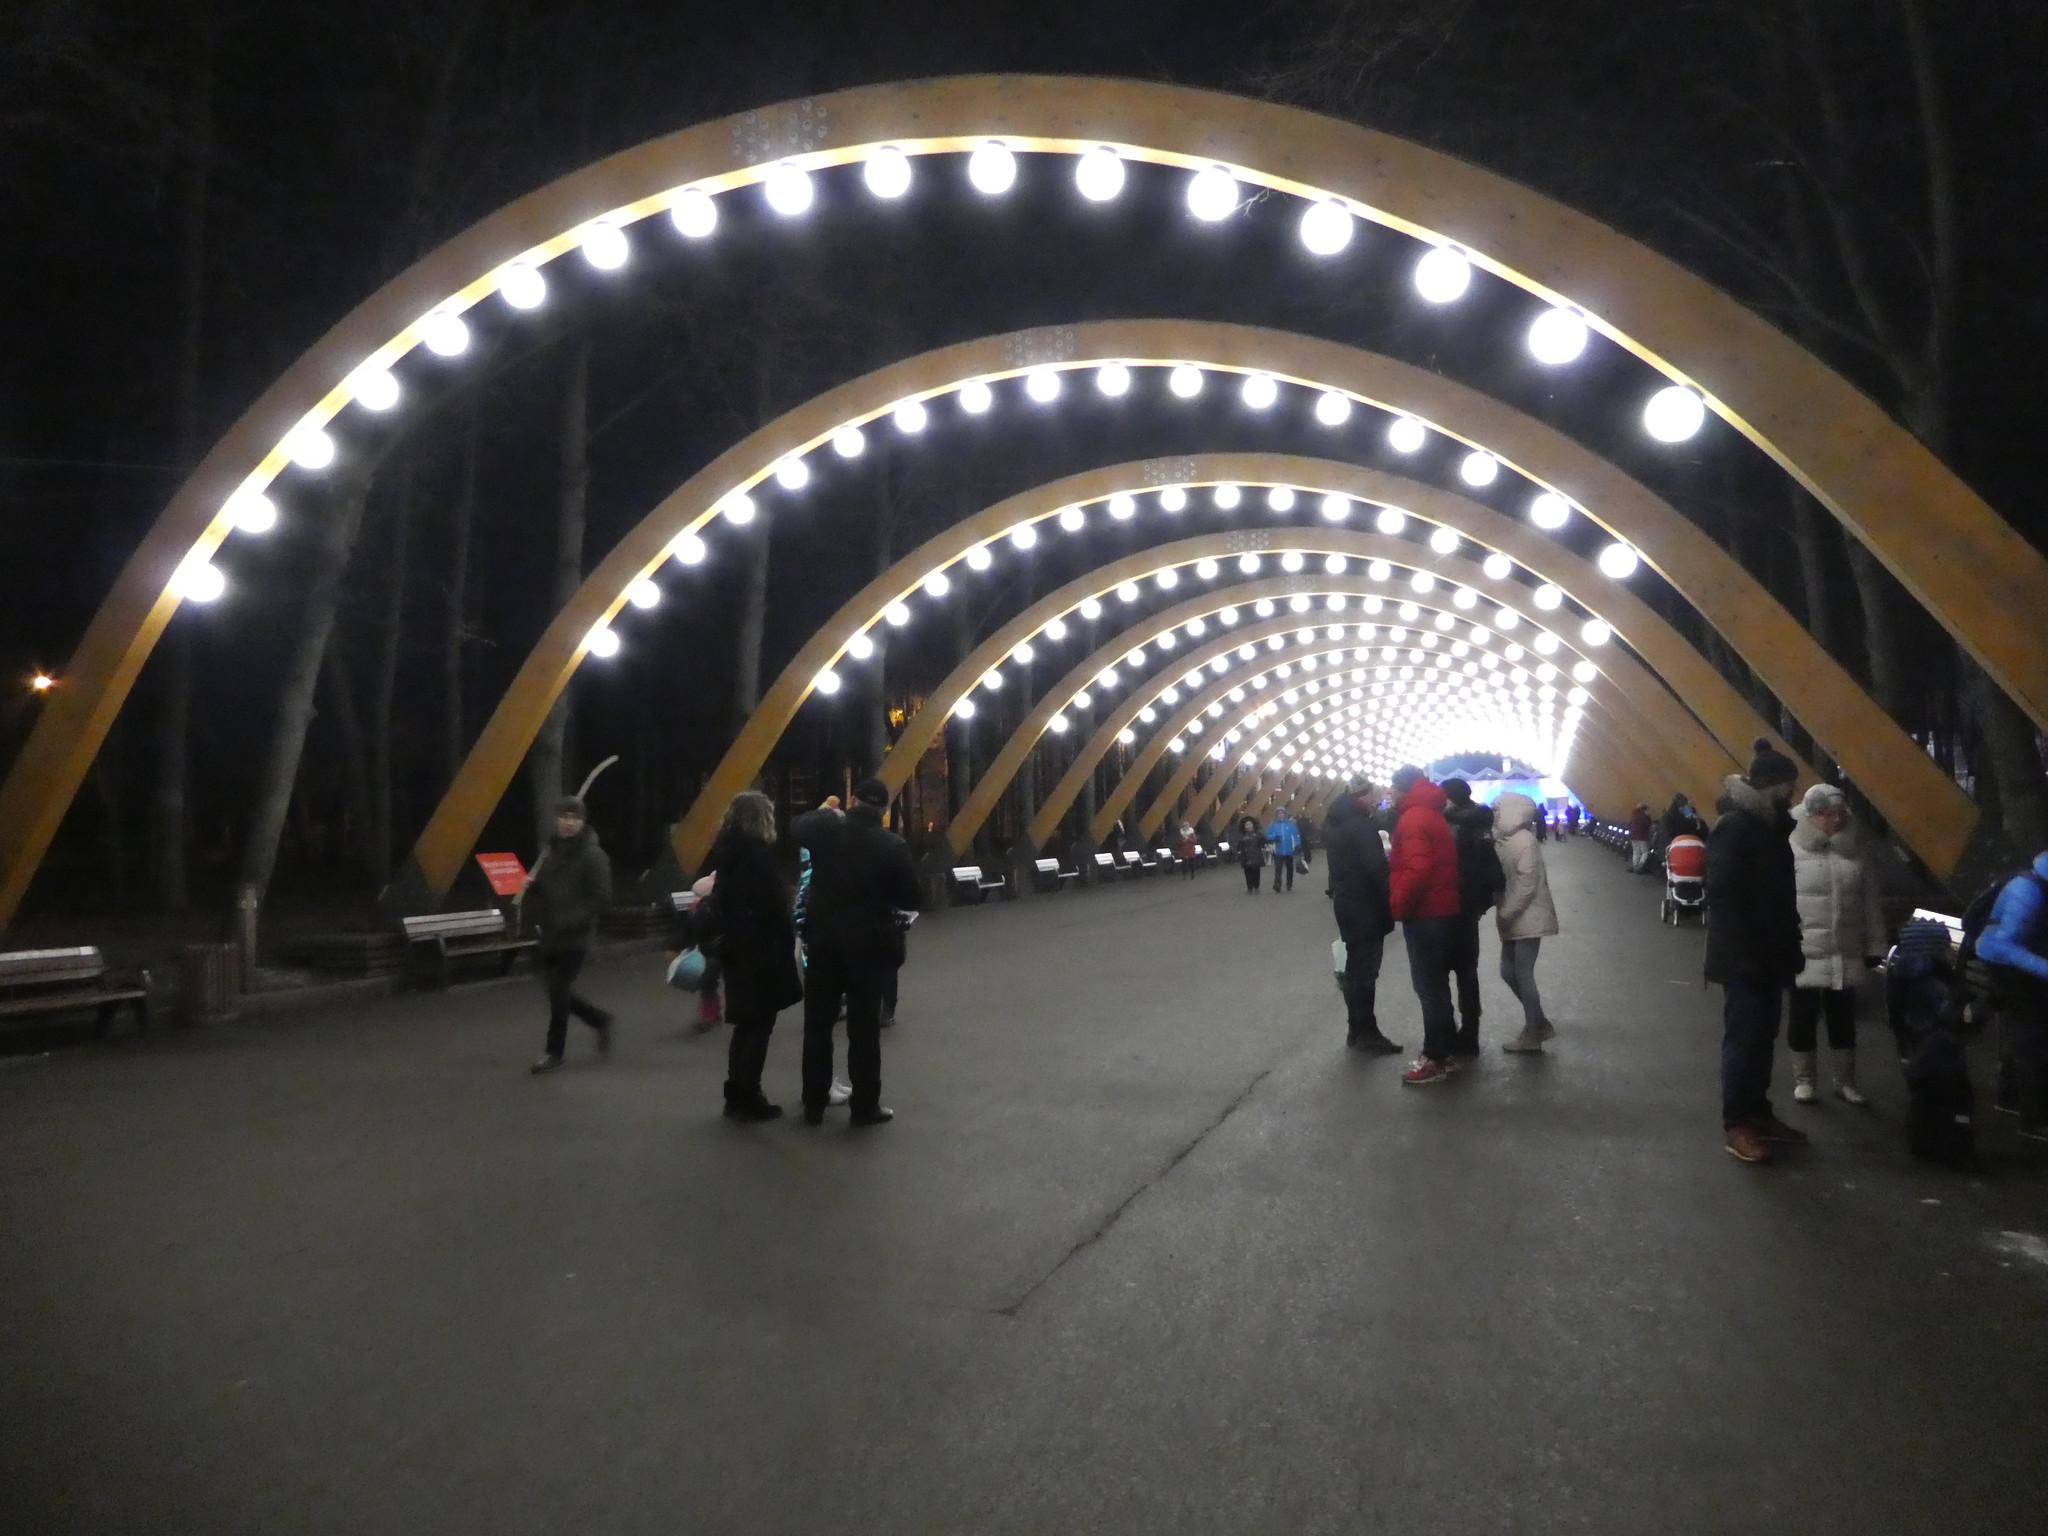 Sokolniki Park archway, Moscow